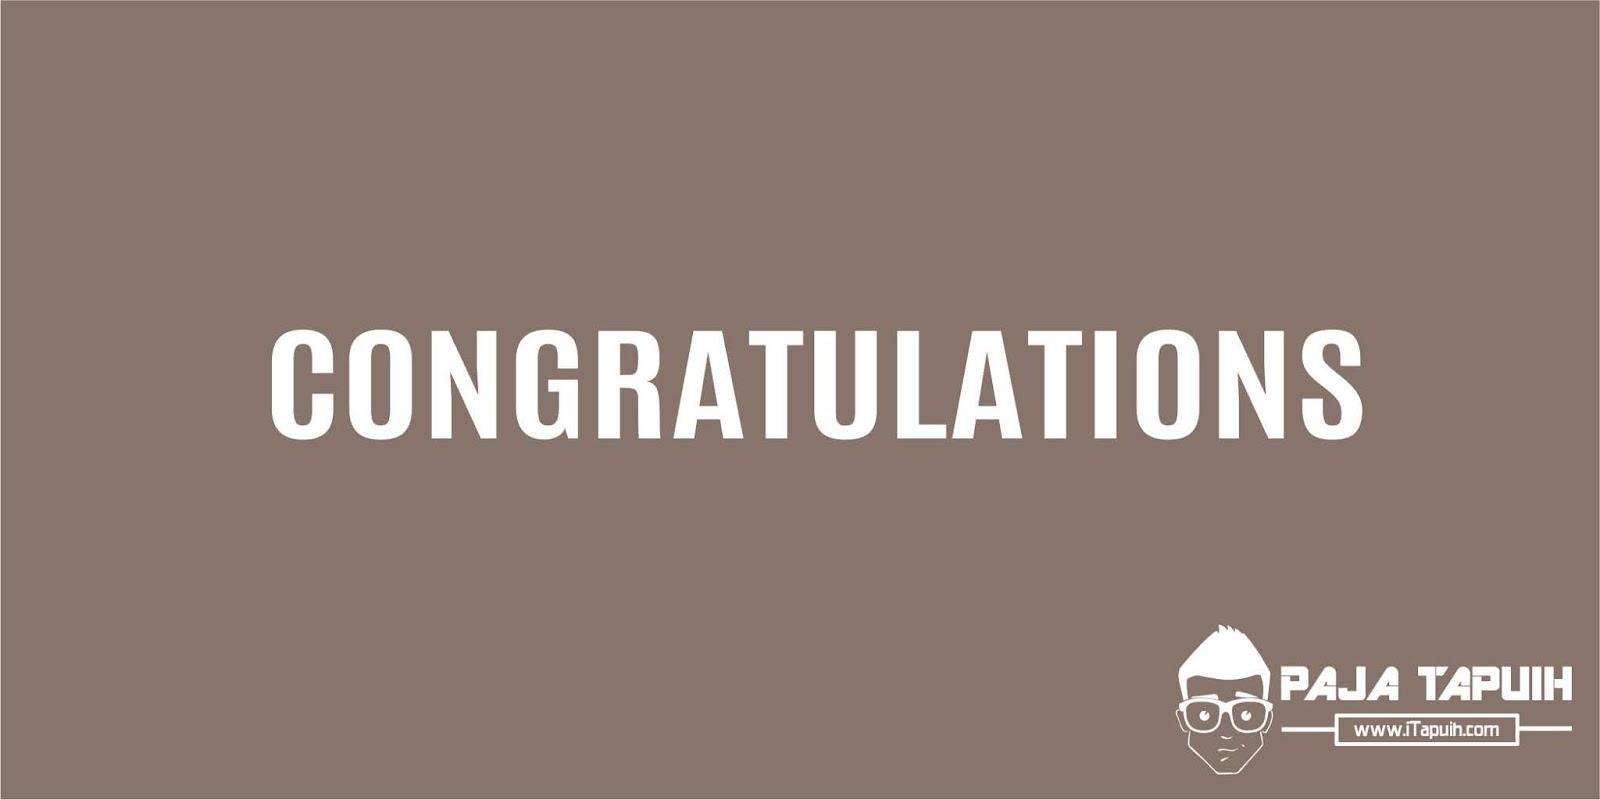 45 Kata Bahasa Inggris Pengganti Congratulations